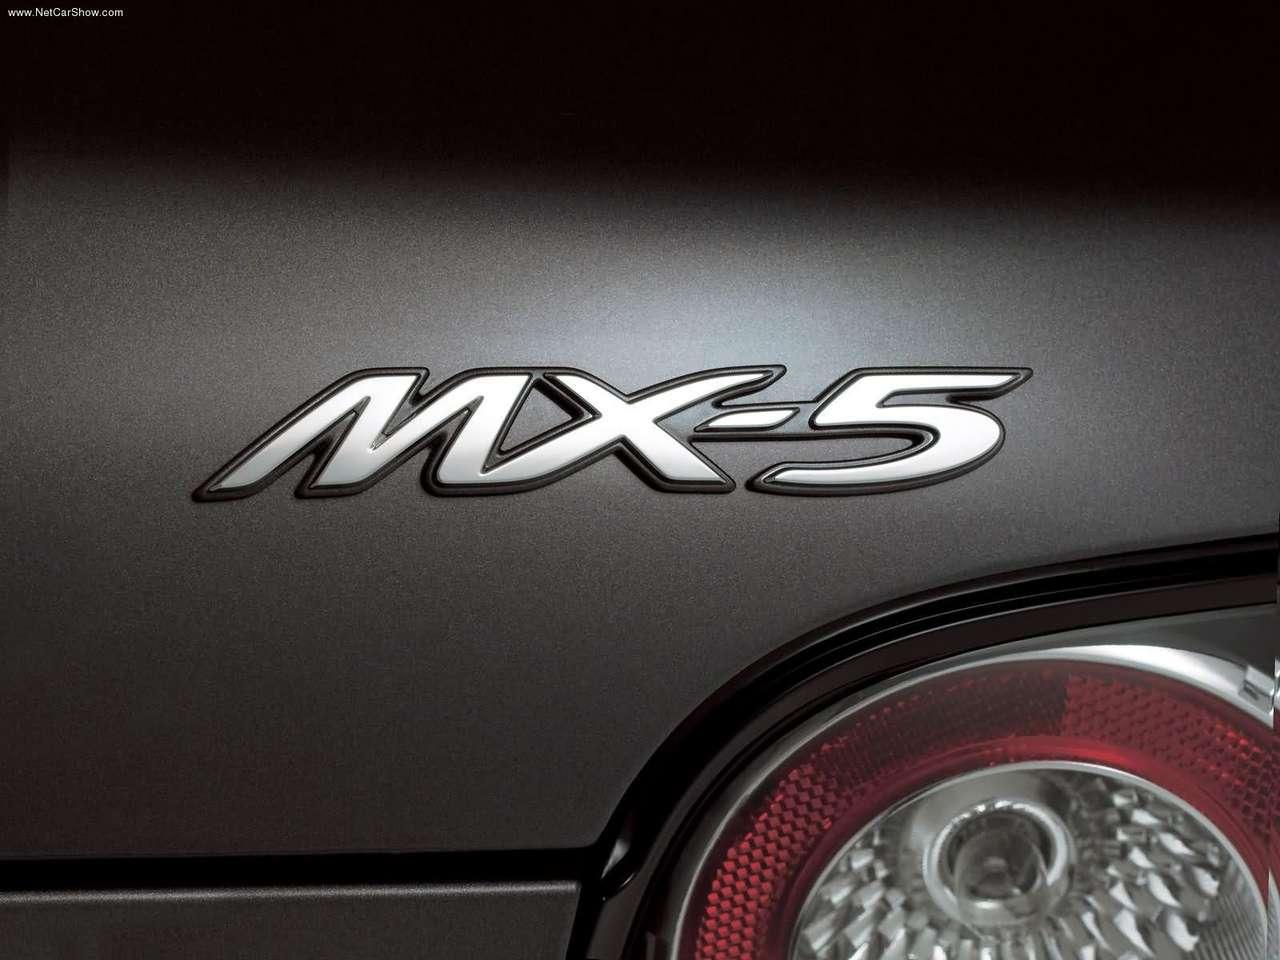 Mazda MX-5, Mazda, MX-5, MX5, Miata, roadster, convertible, sports car, JDM, Japanese car, classic car, retro car, ebay, ebay motors, autotrader, car, cars, motoring, automotive, featured, not2grand, www.not2grand.co.uk,